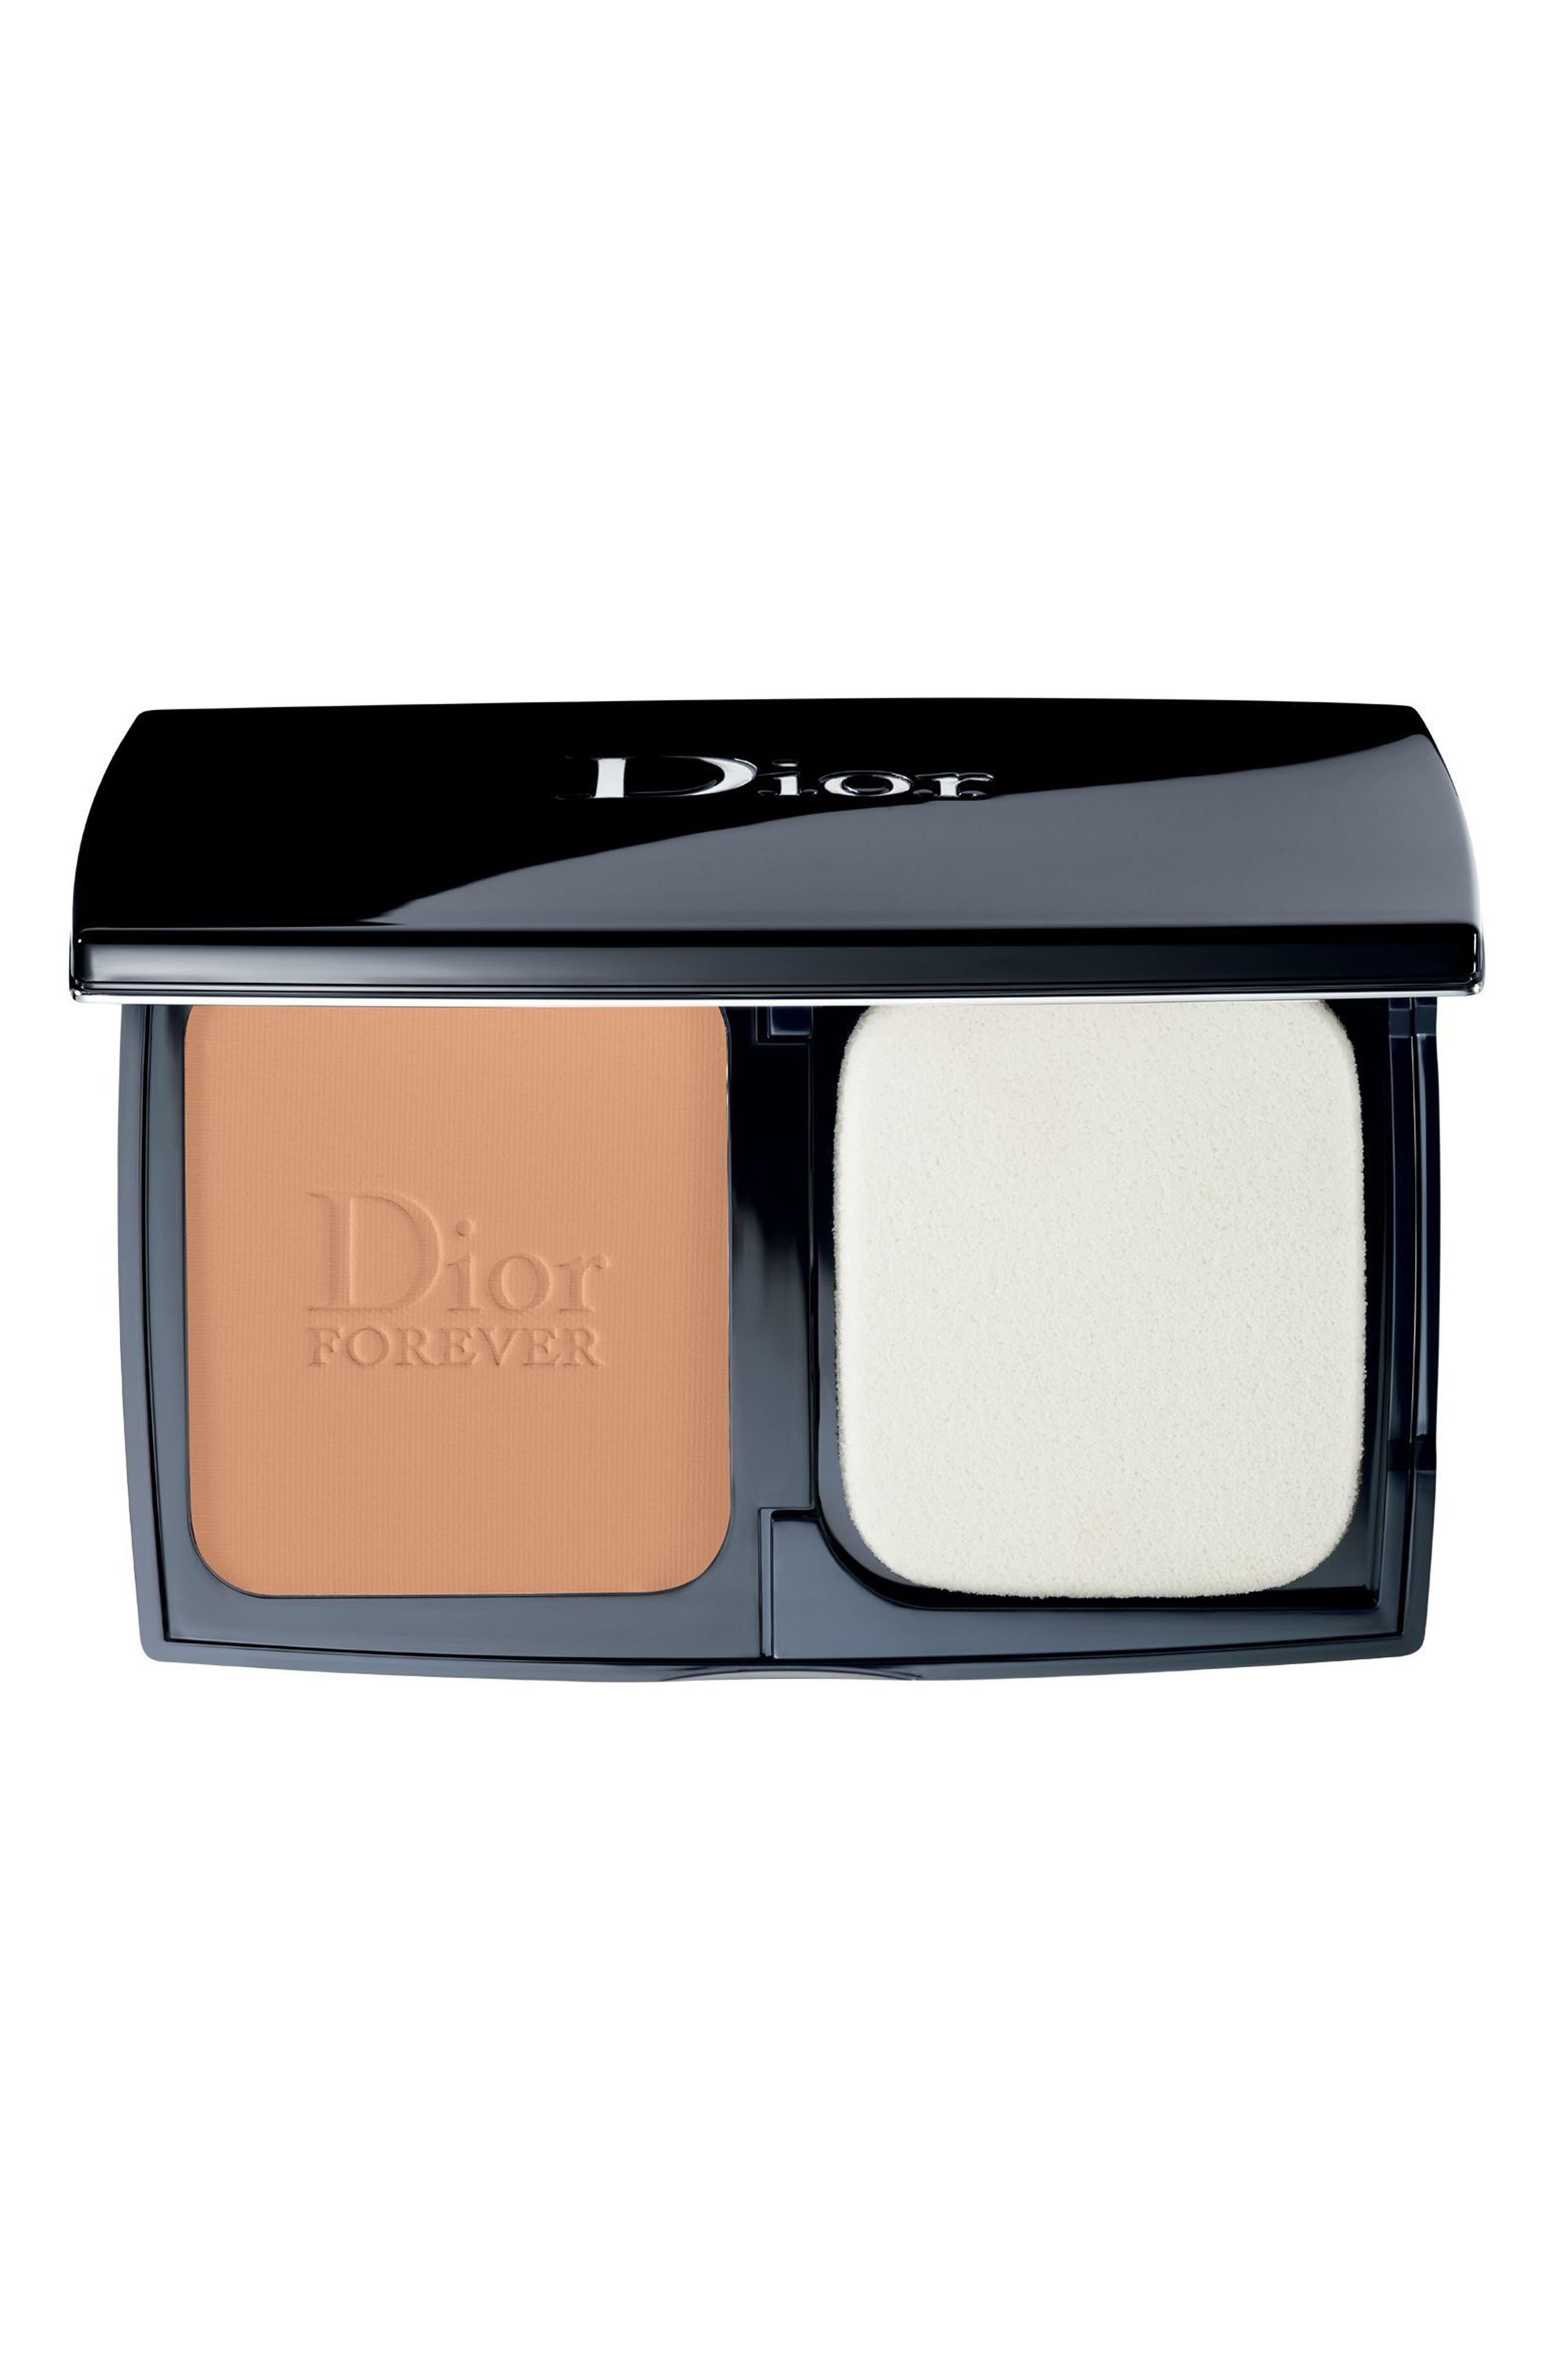 Dior Diorskin Forever Extreme Control - 035 Desert Beige